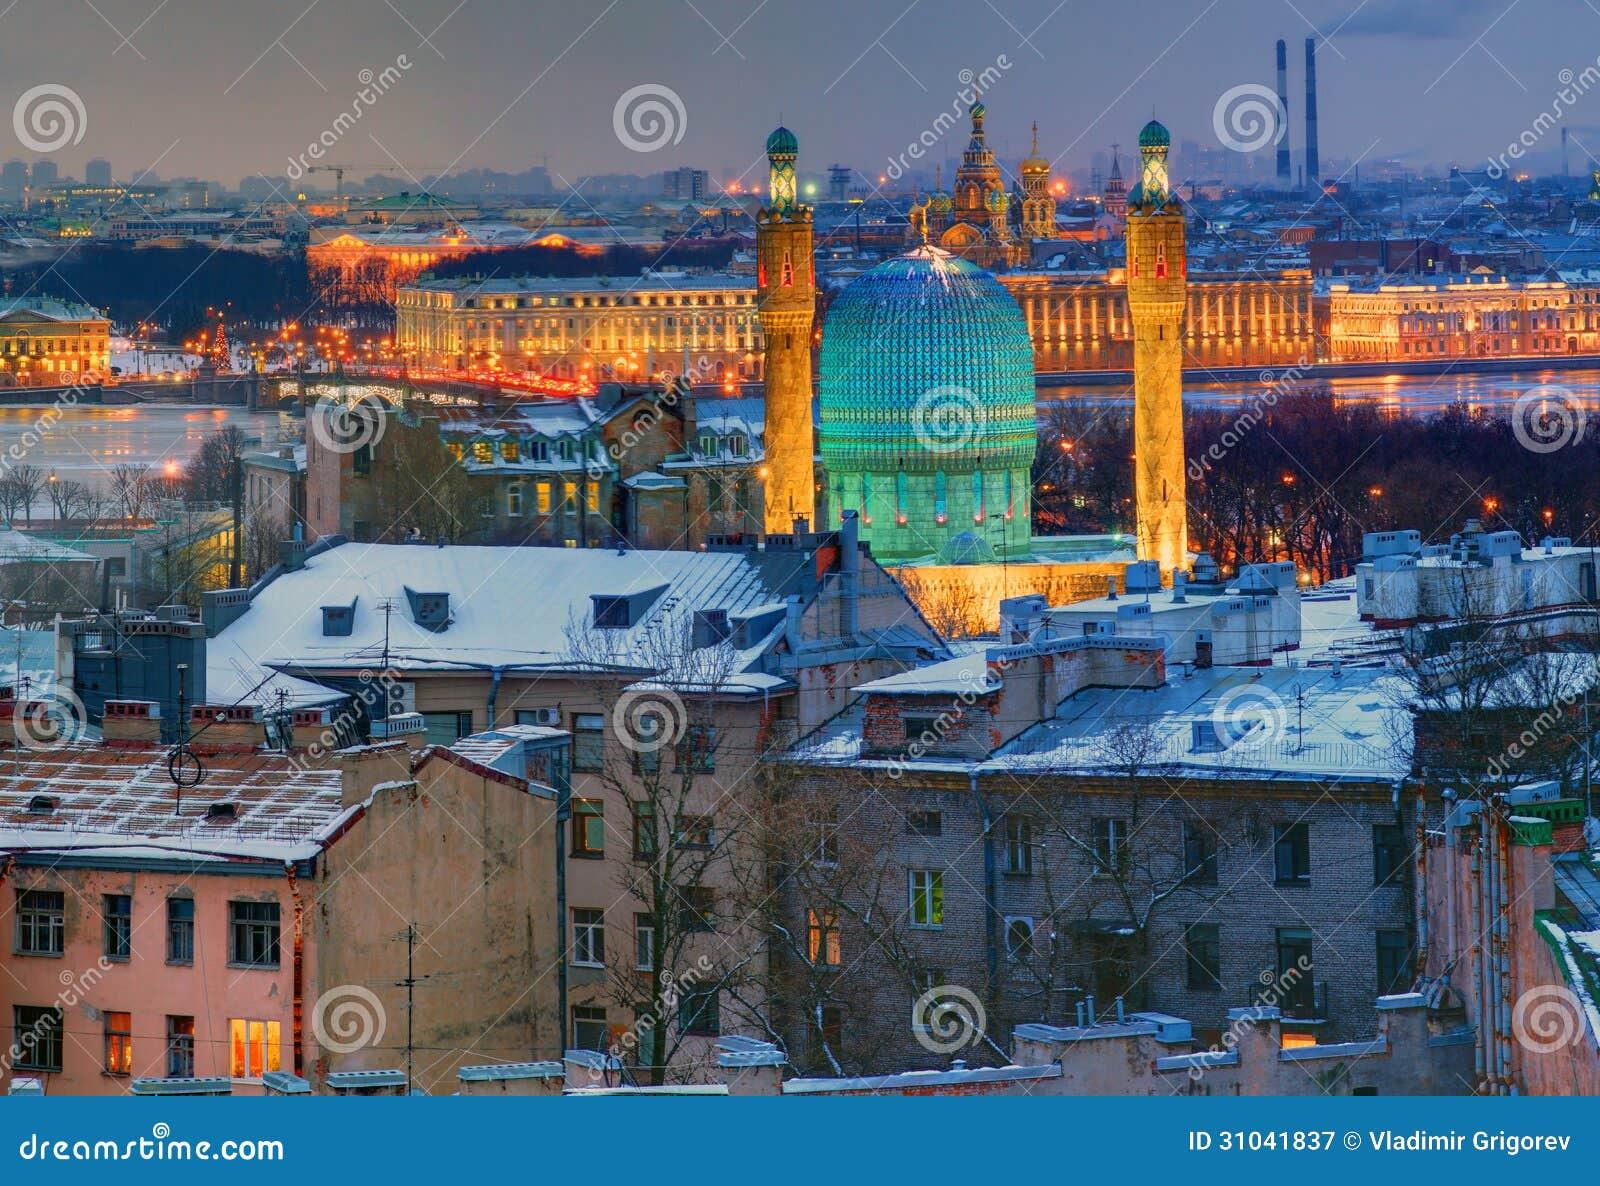 De Moskee van heilige Petersburg, moskee-Jami. Nachtmening vanaf bovenkant.